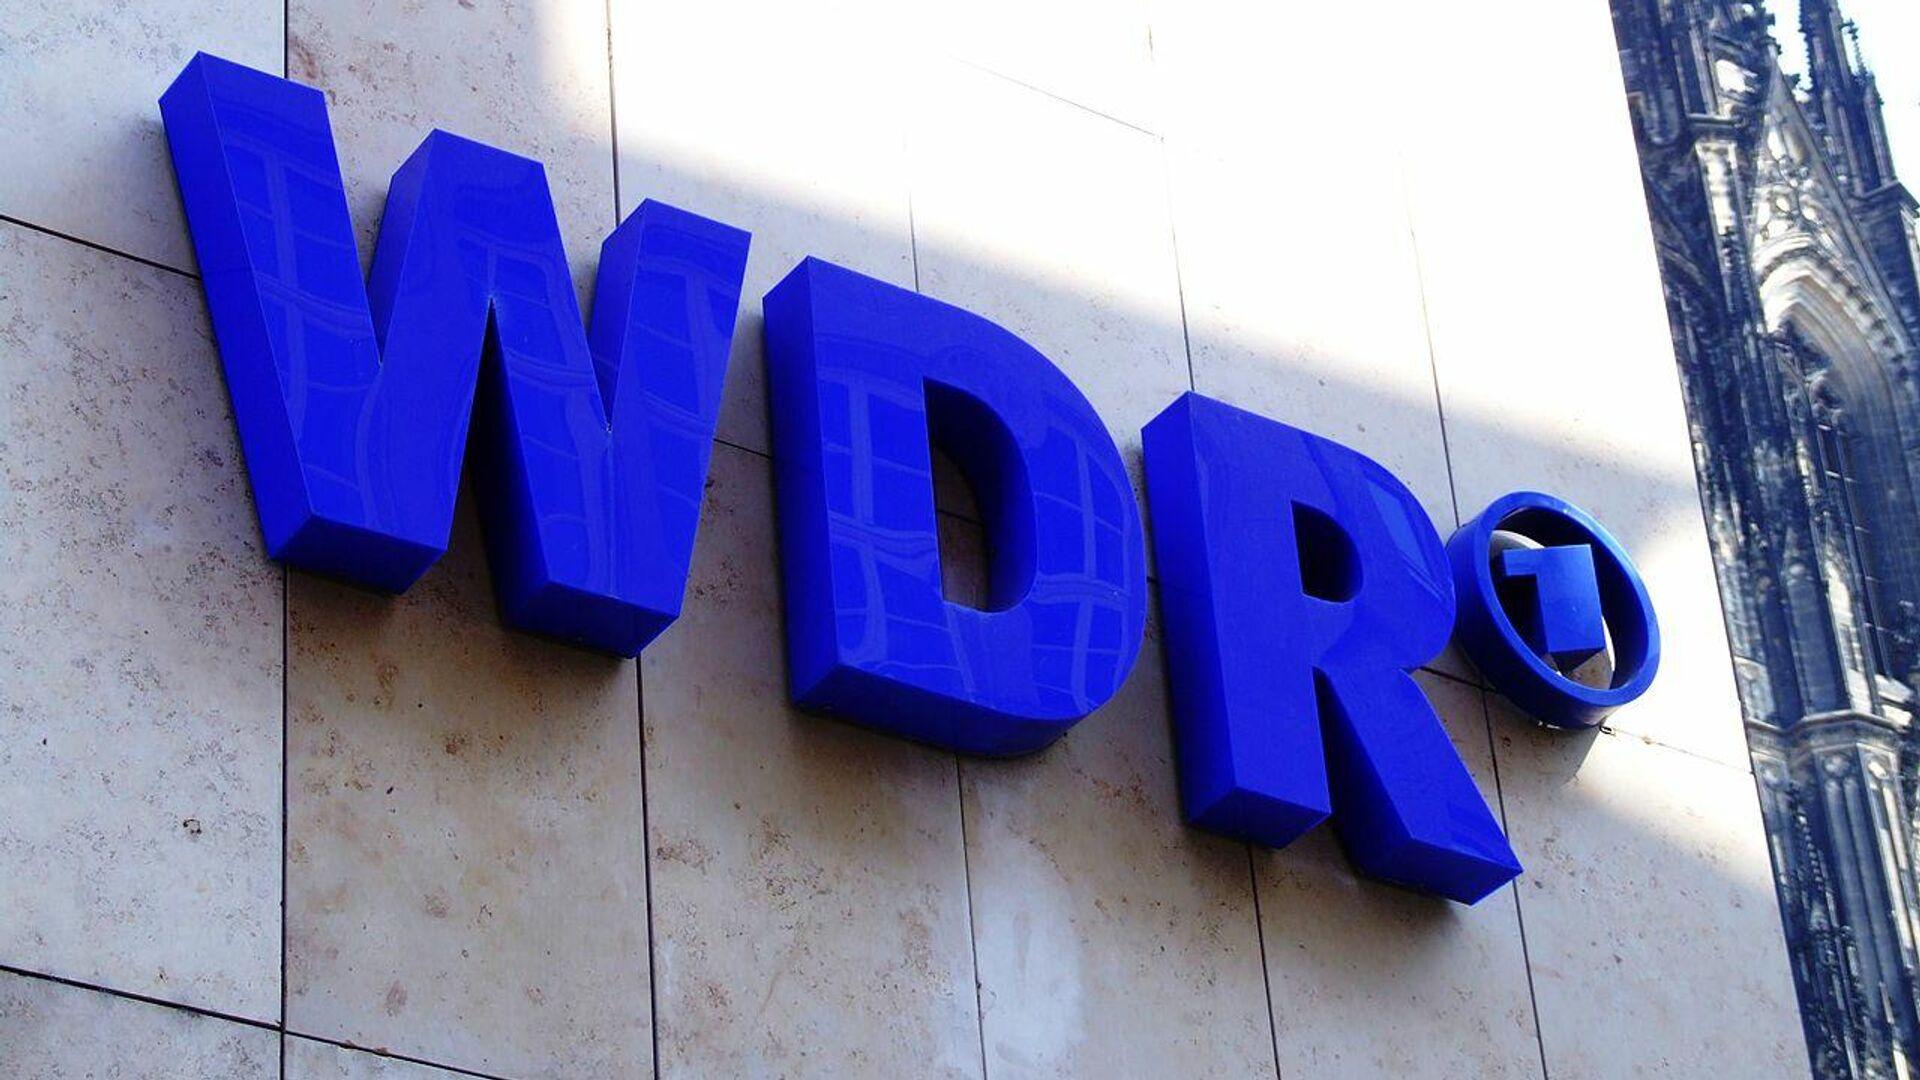 WDR-Logo (Archivbild) - SNA, 1920, 15.09.2021